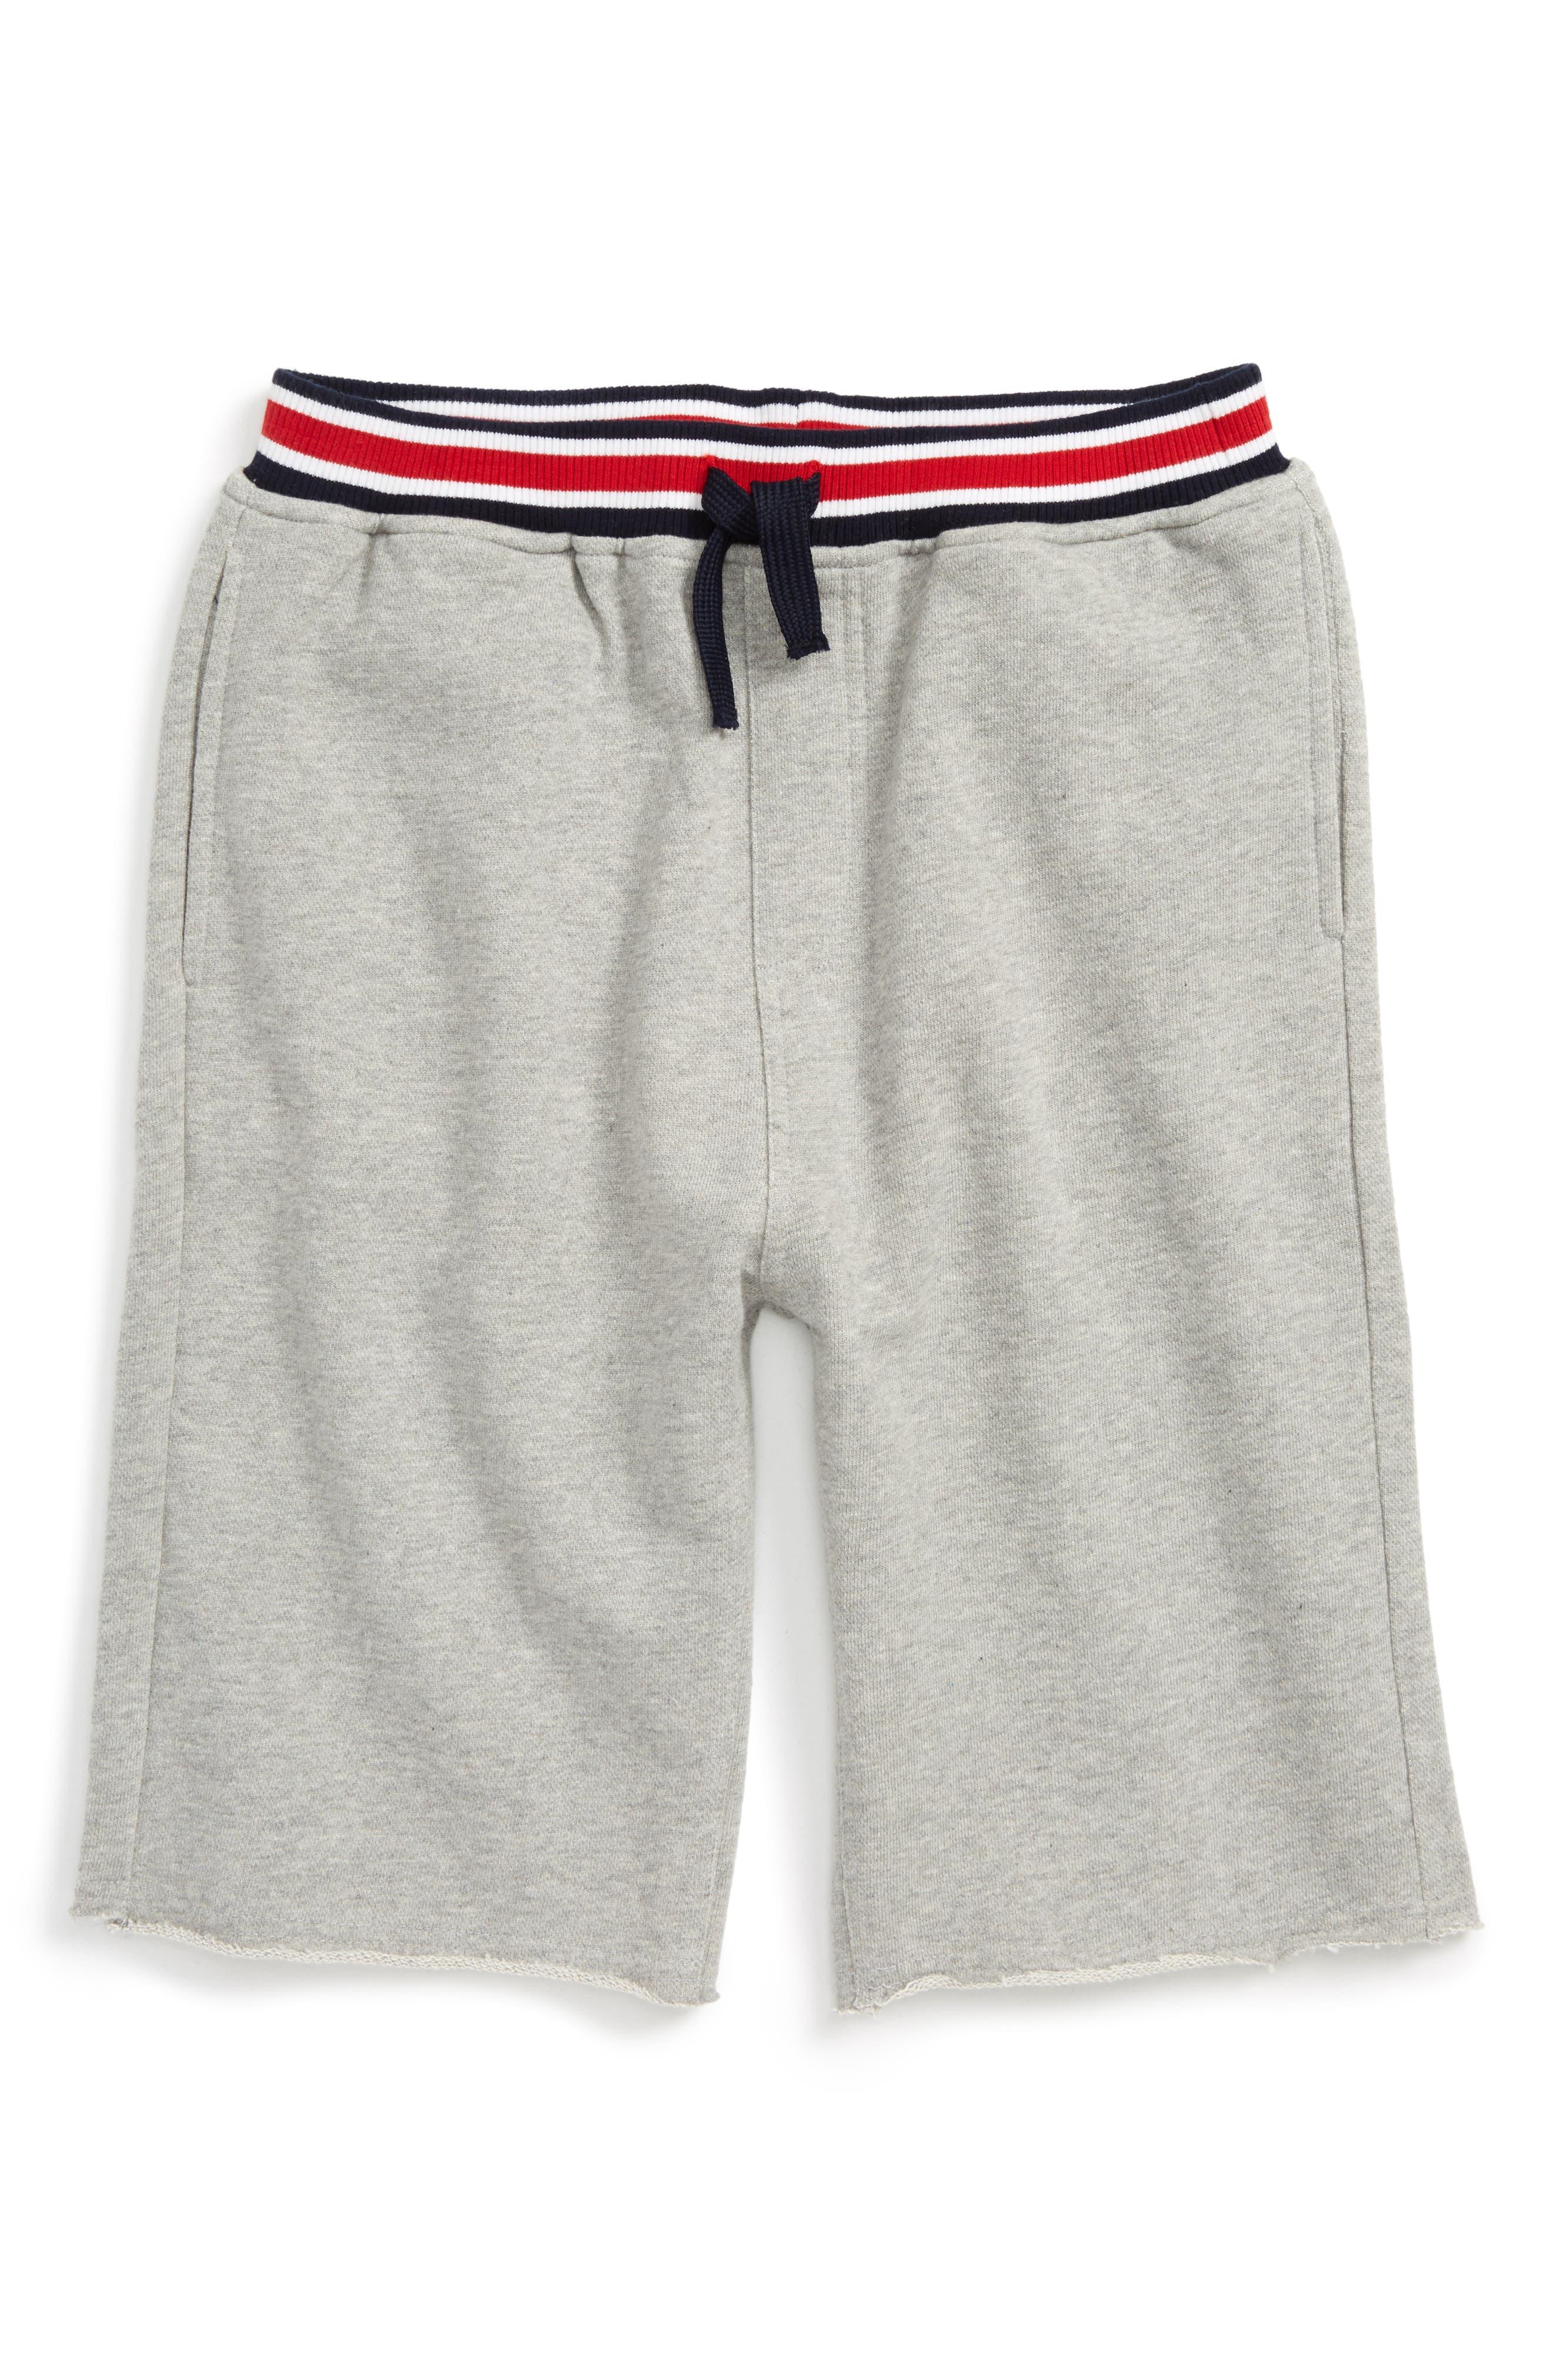 Alternate Image 1 Selected - Peek Varsity Knit Shorts (Toddler Boys, Little Boys & Big Boys)